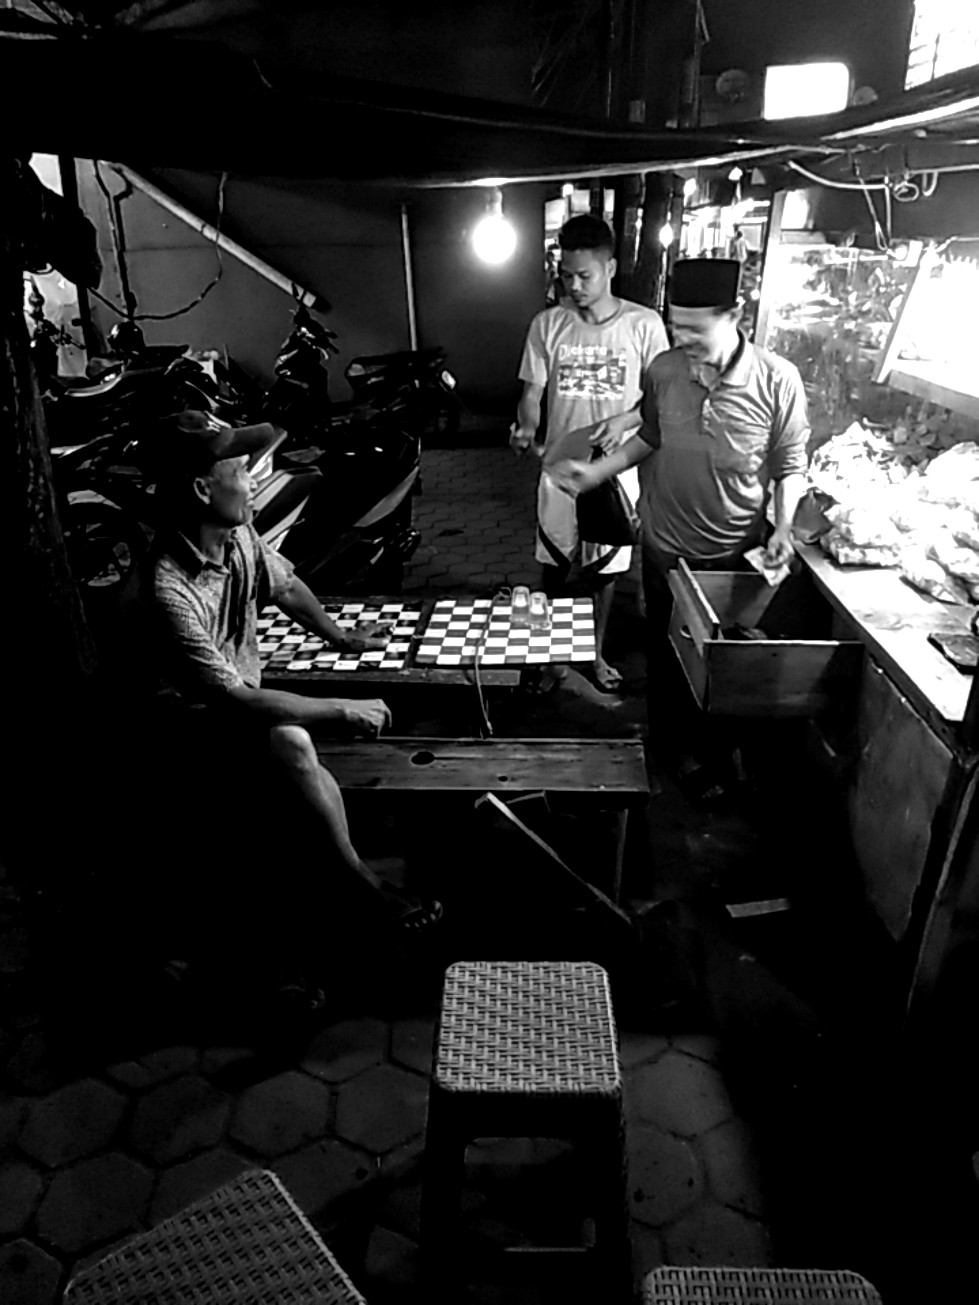 Keadaan sudah aman, ayo main catur lagi